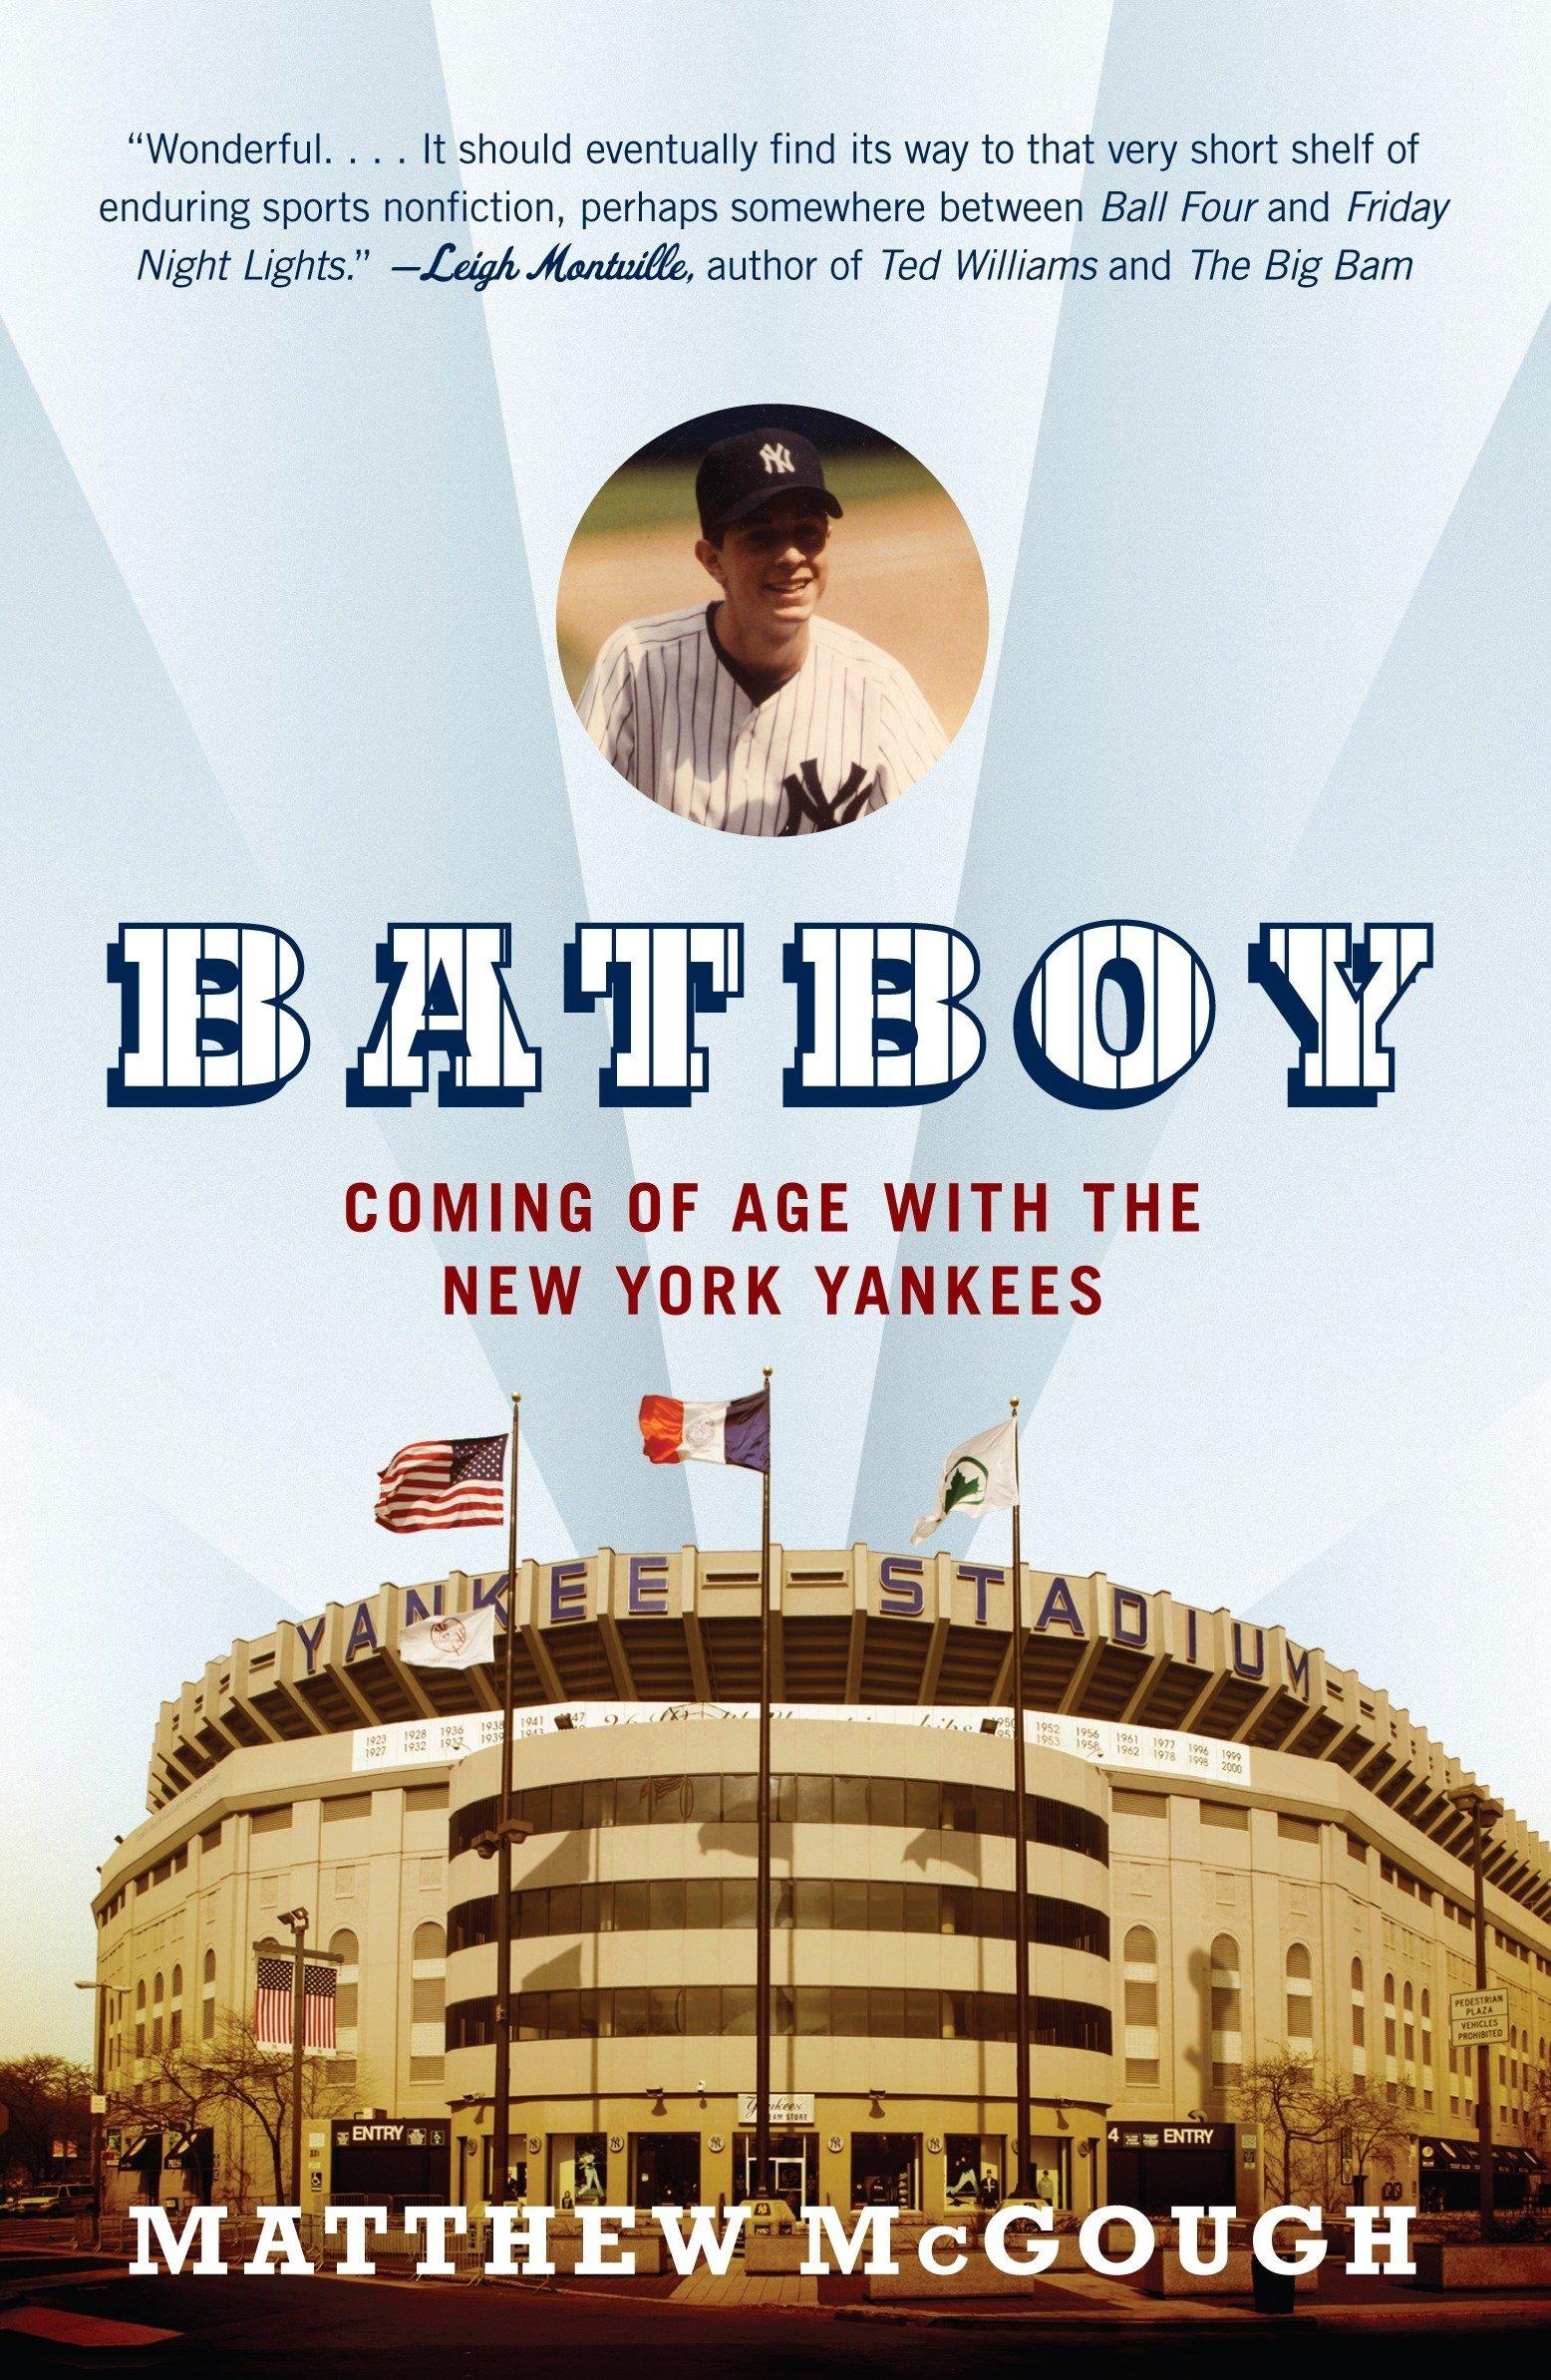 Bat Boy Coming York Yankees product image